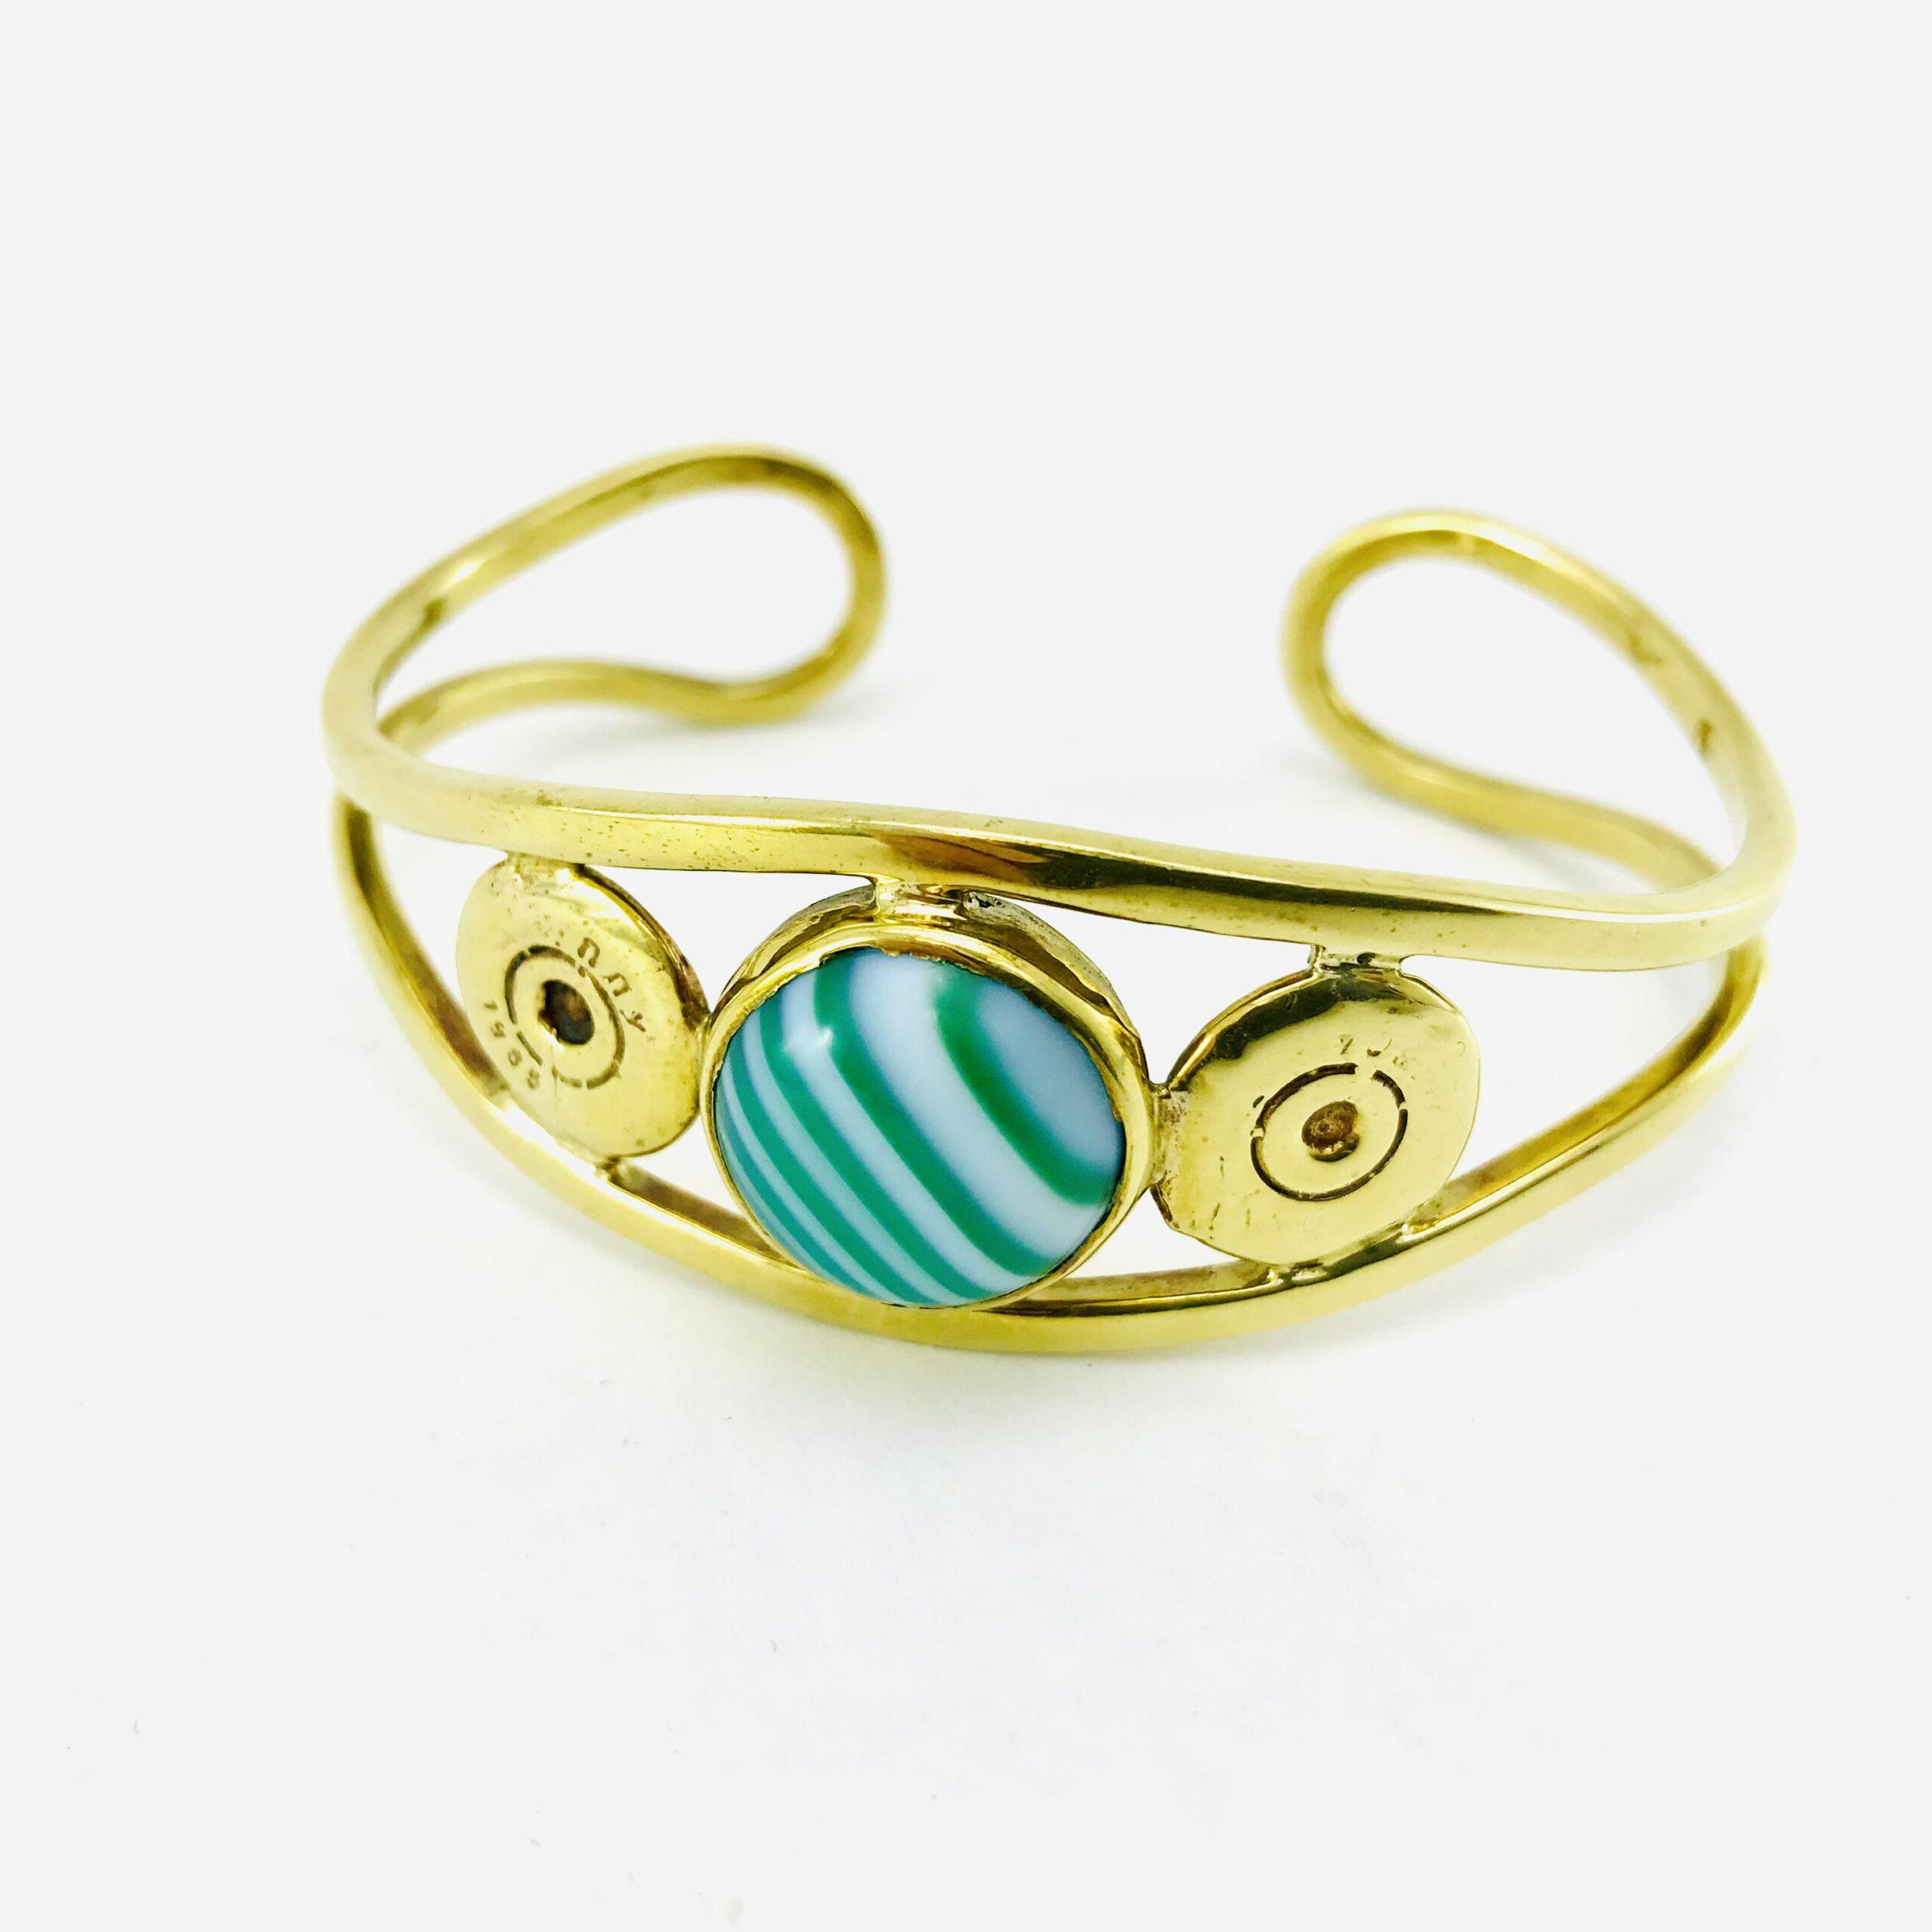 Bracelet Manchette Arrondi - Douille De Balle Recyclée - Agate Verte